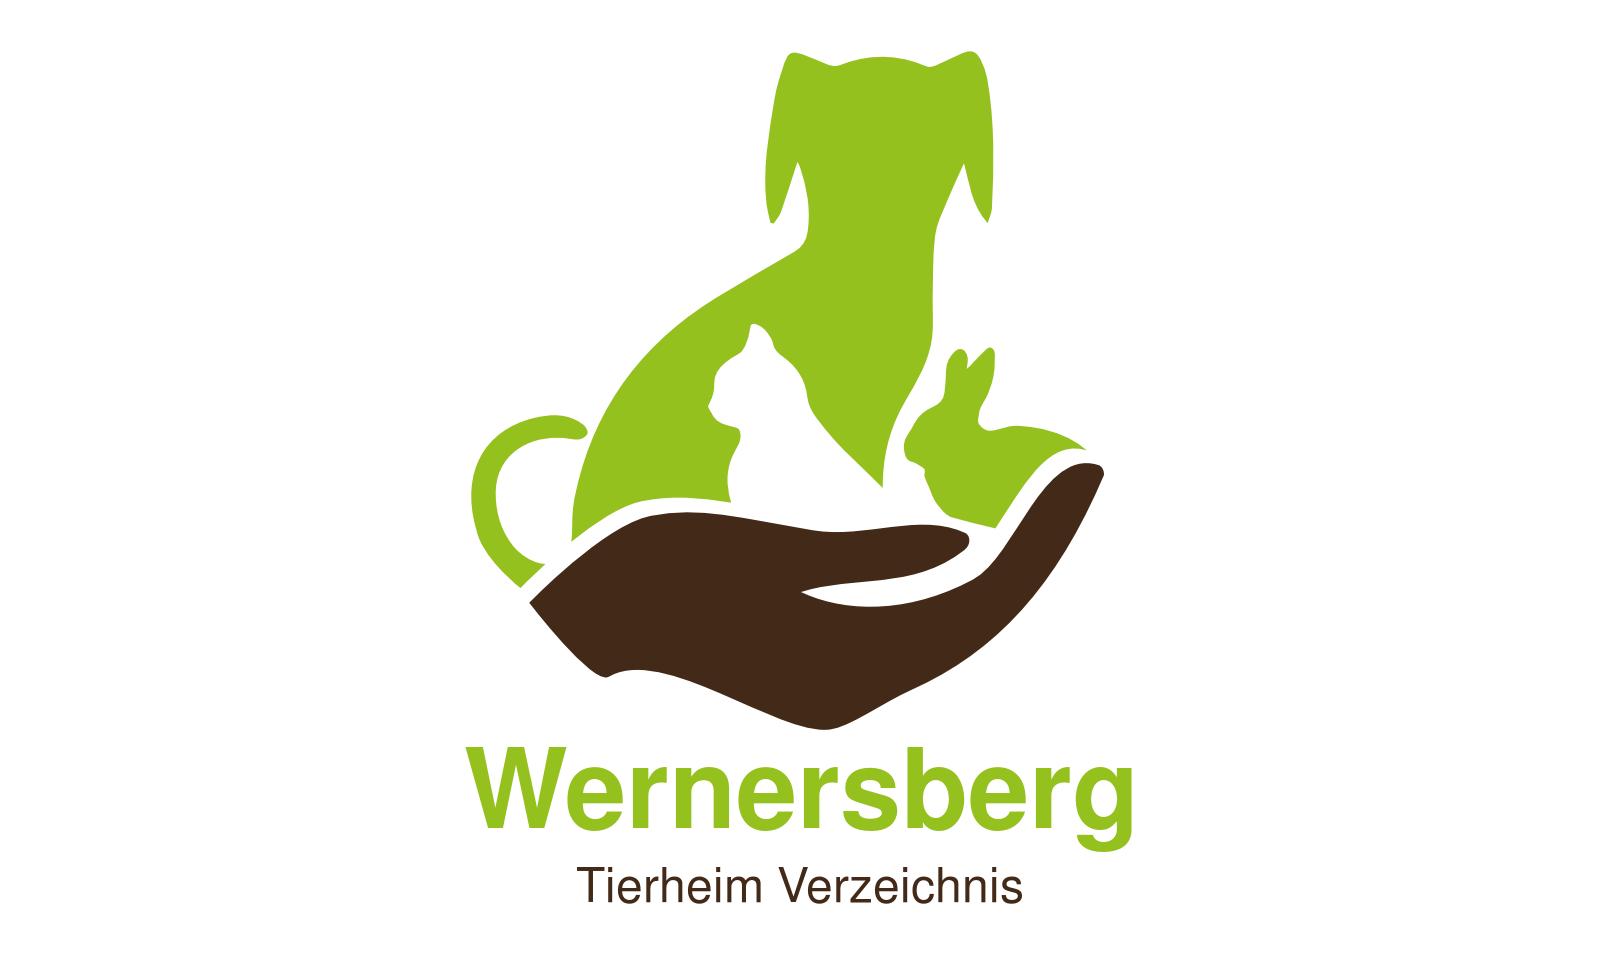 Tierheim Wernersberg